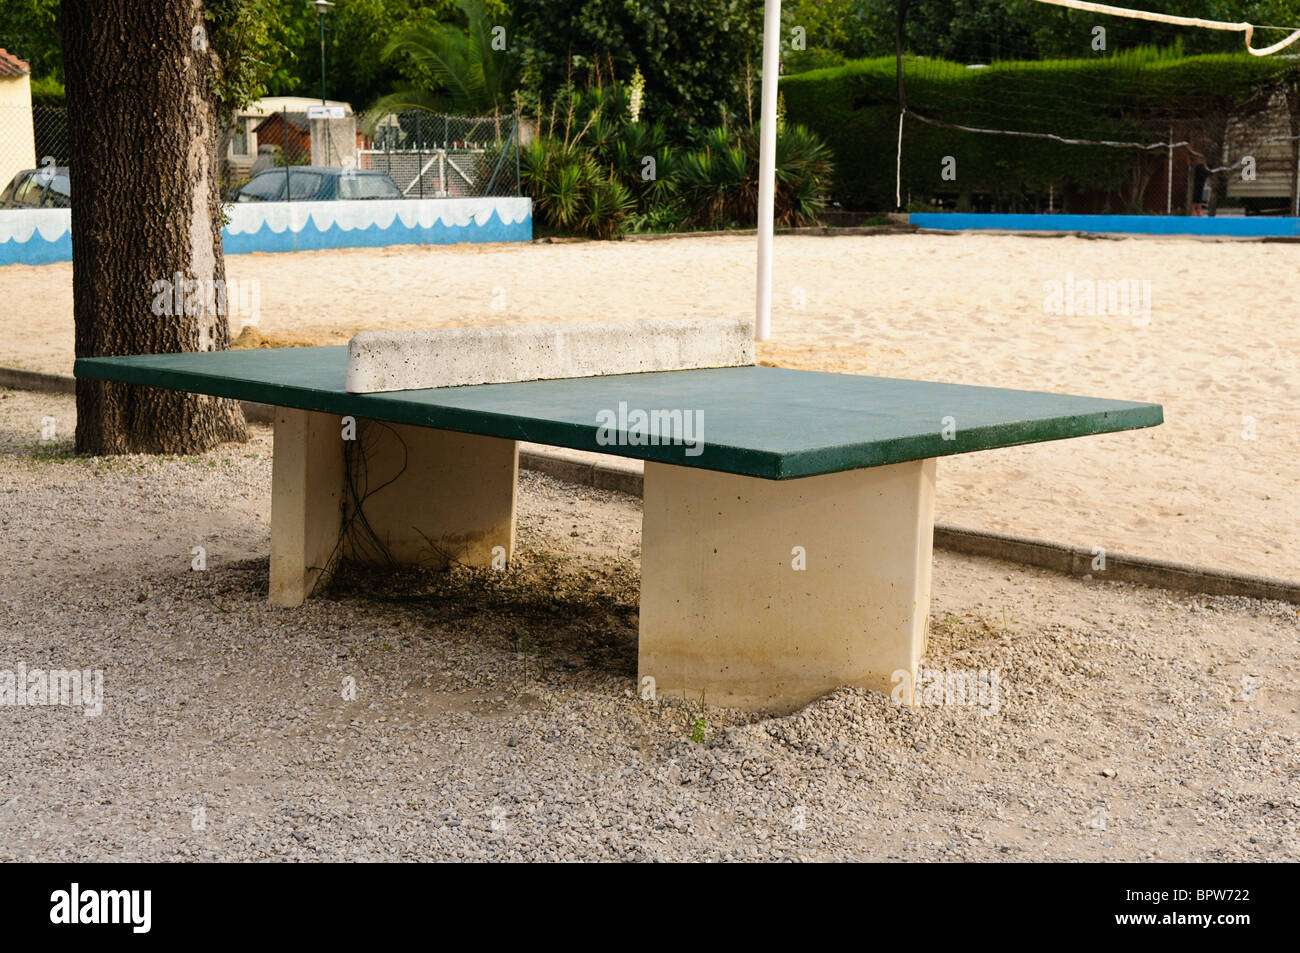 Ping pong pingpong stock photos ping pong pingpong stock images alamy - Outdoor table tennis table nz ...